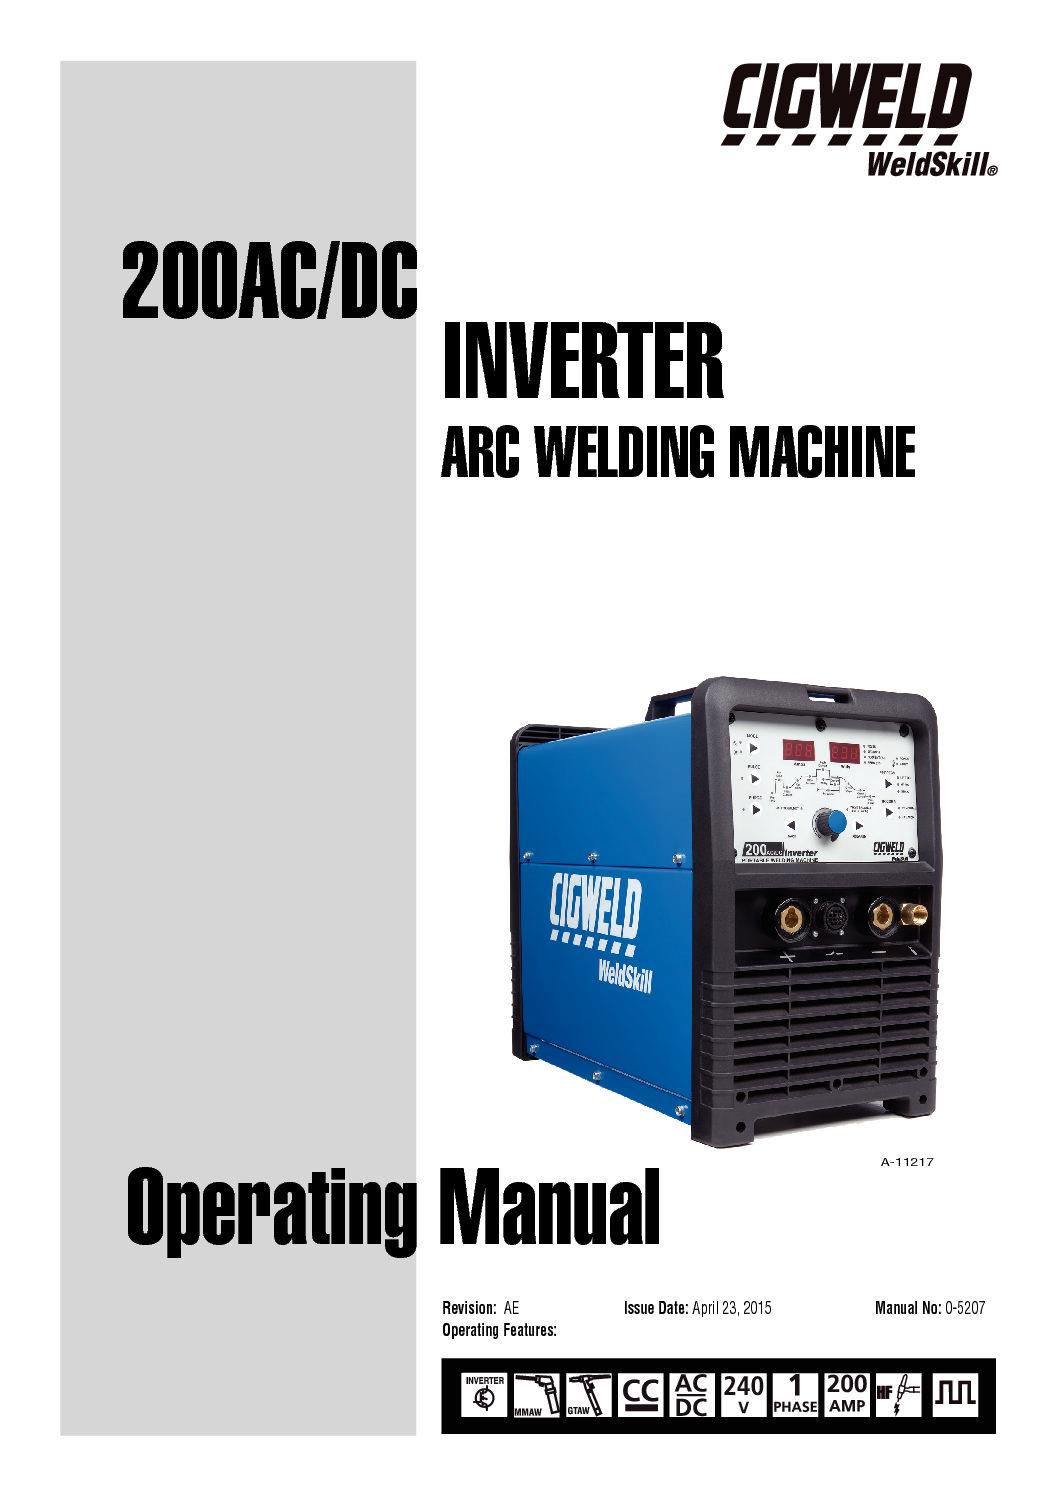 Weldskill 200 Ac Dc Cigweld Welding Plant Diagram Operating Manual